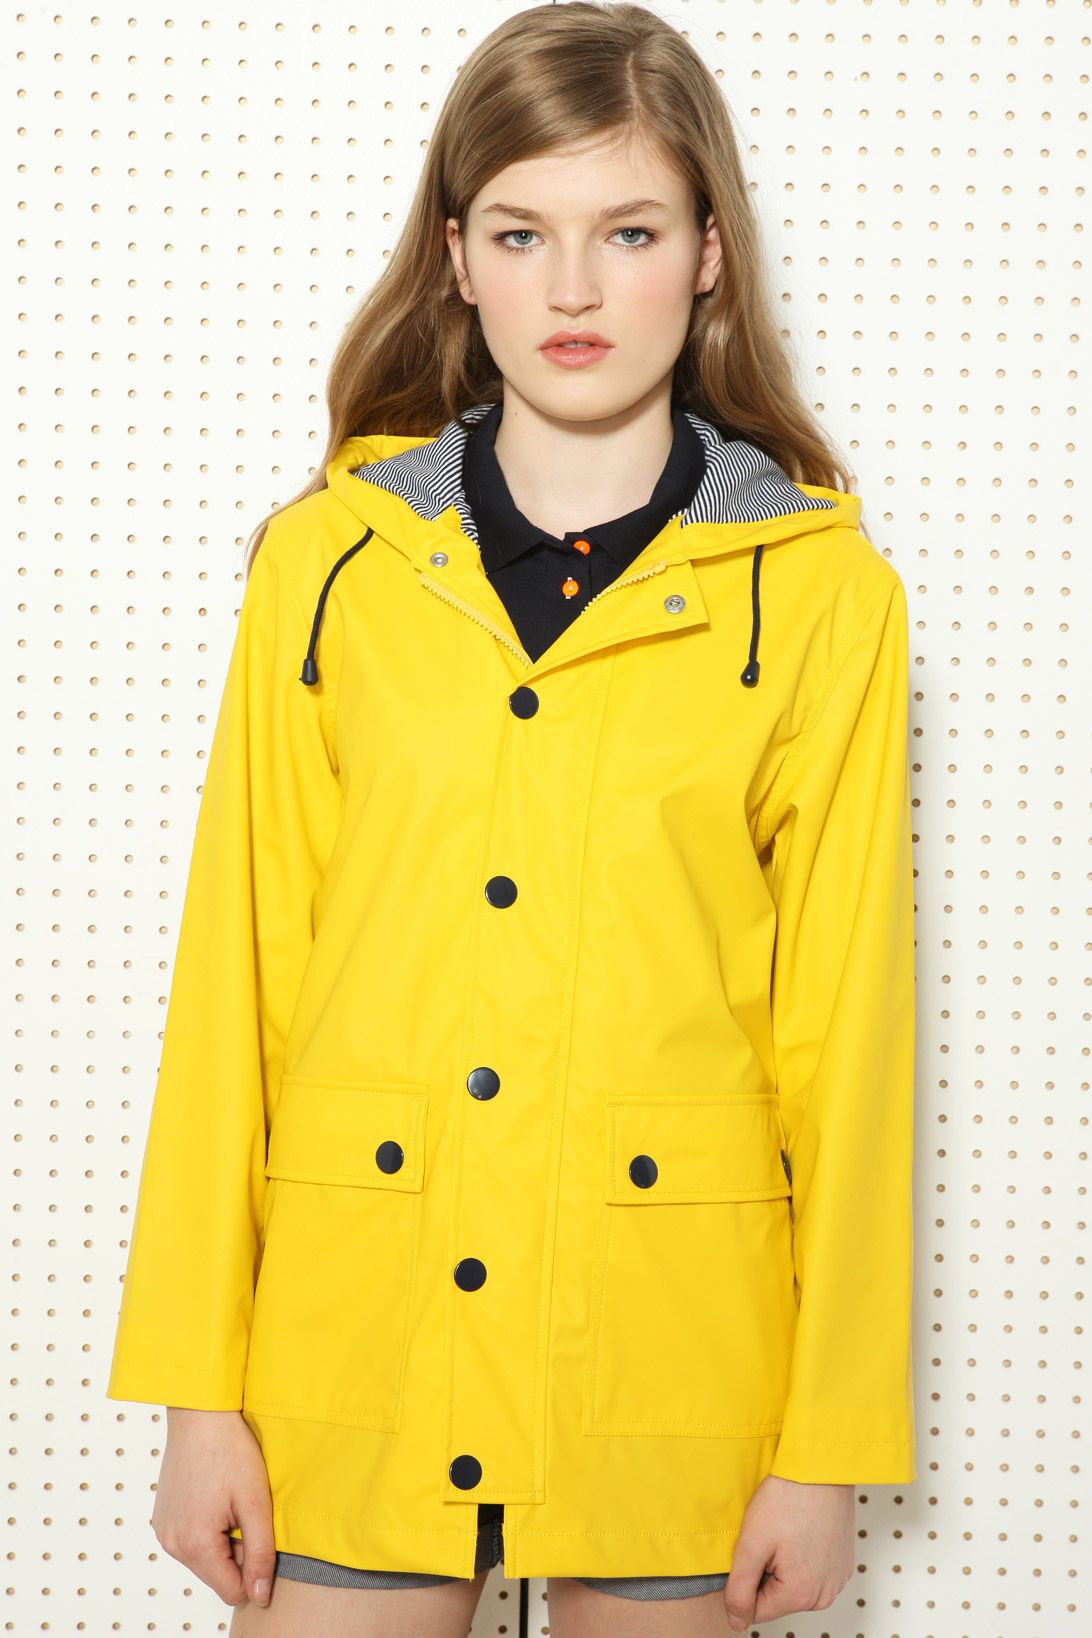 Petit Bateau Yellow Raincoat at Urban Outfitters | Coats ...